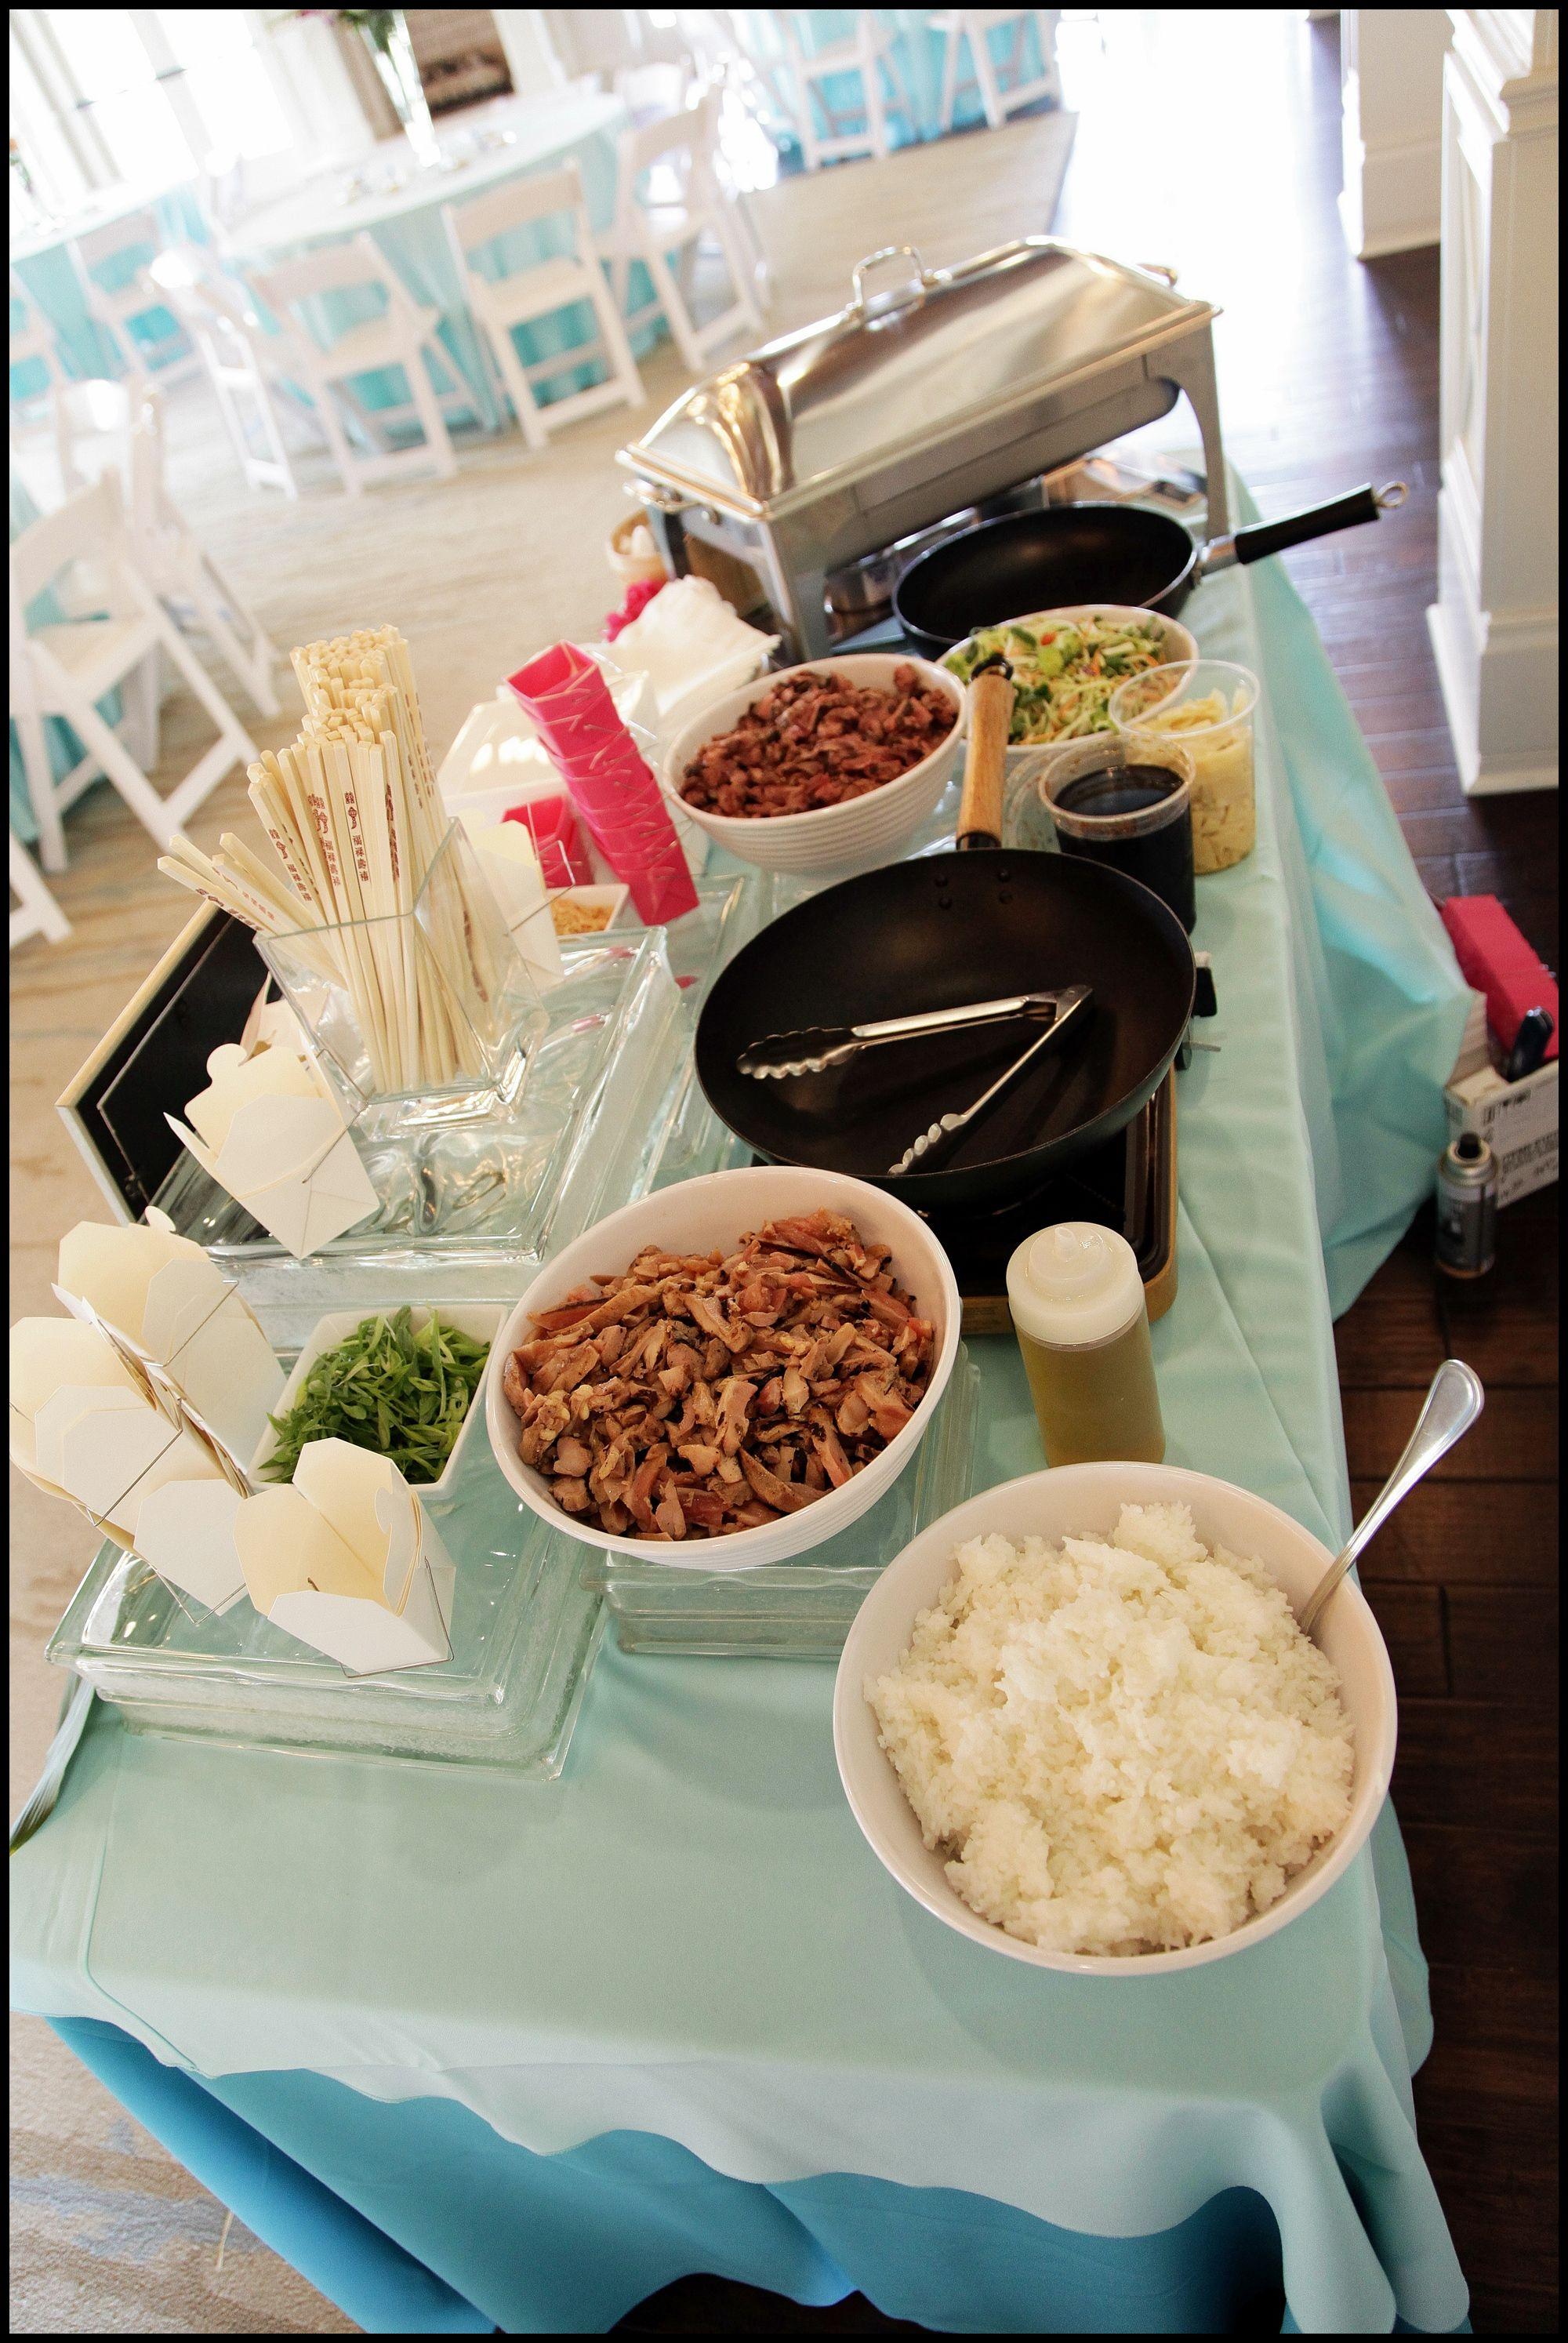 Asian station food displays food